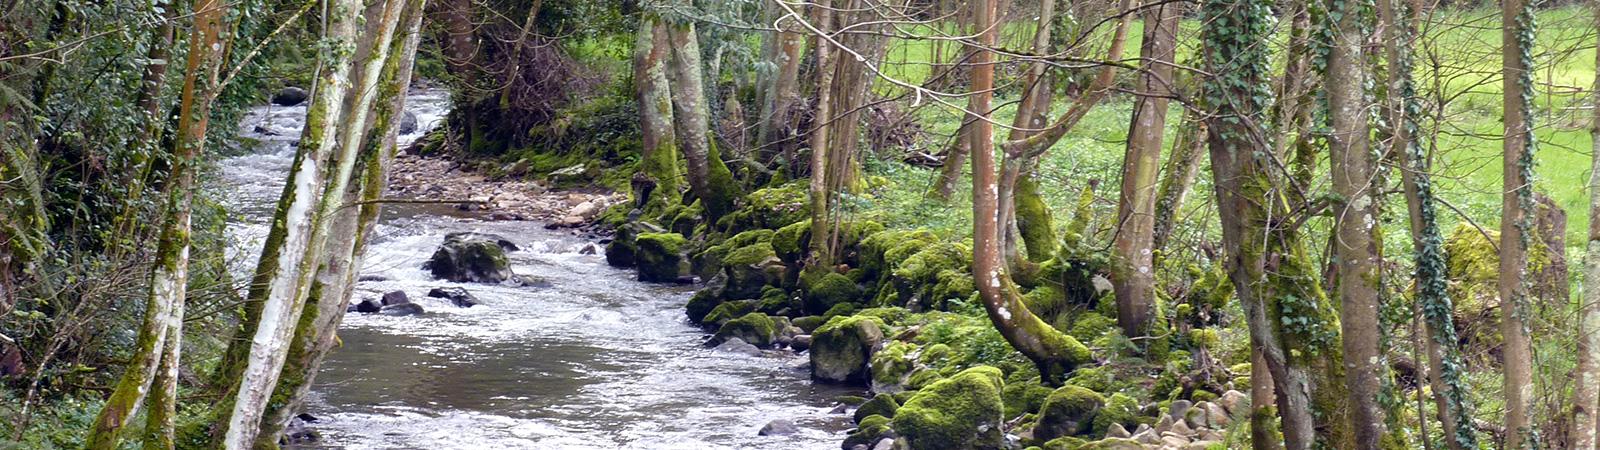 Río Nonaya